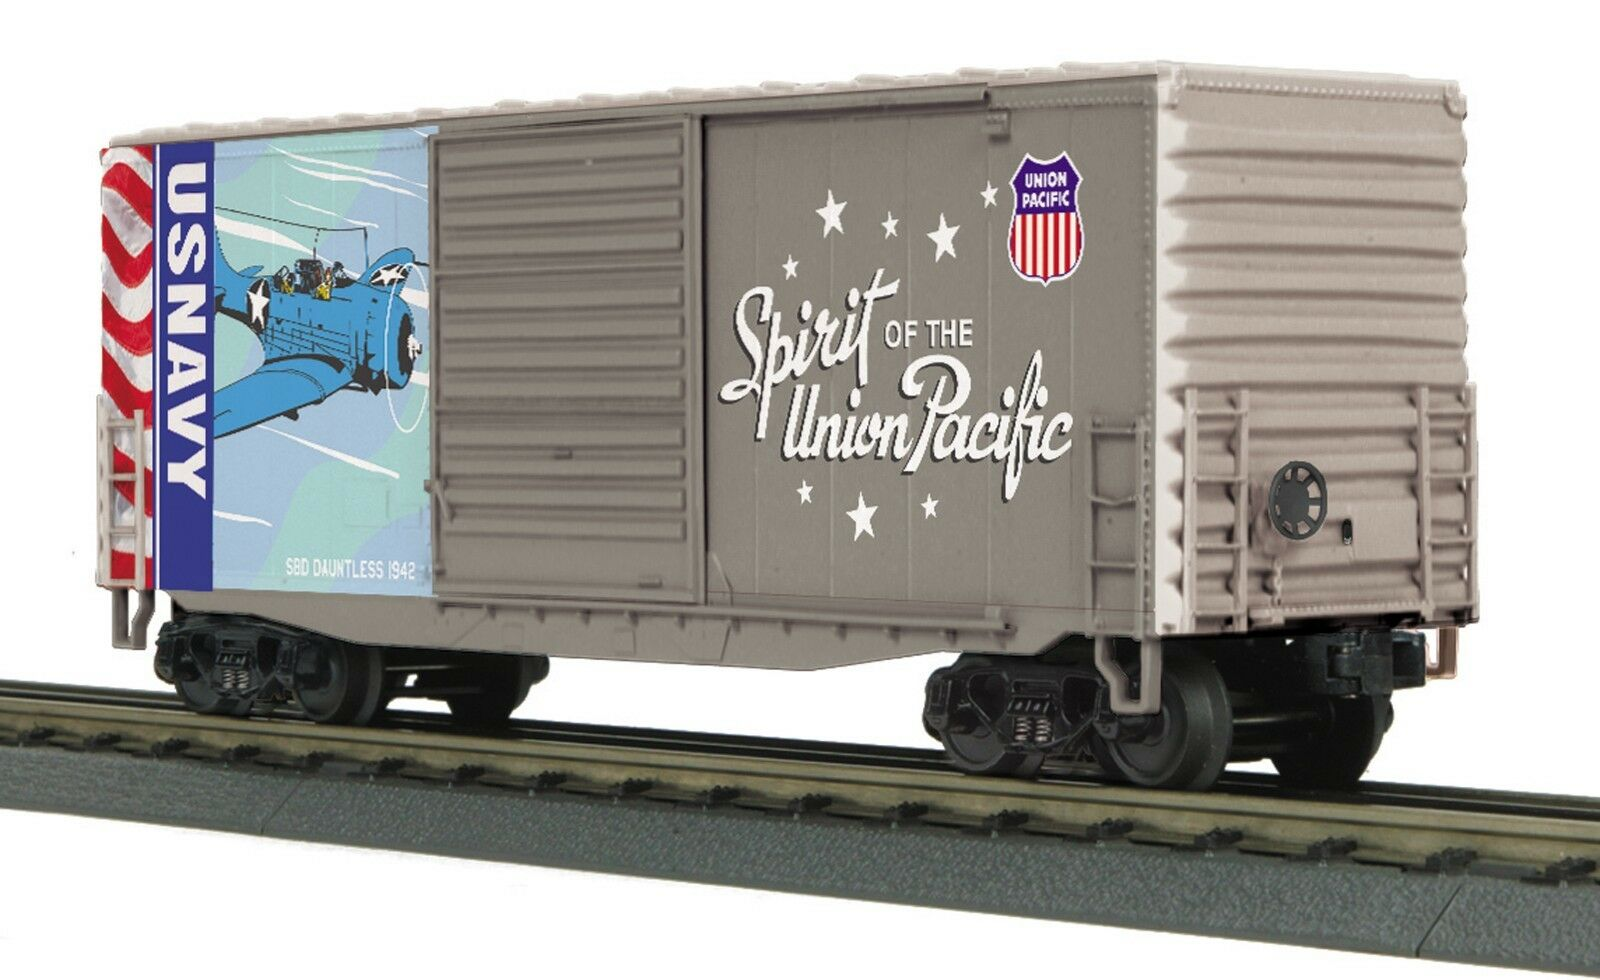 30-74925 Union Pacific (Navy - Spirit of Union Pacific) 40' High Cube Box Car